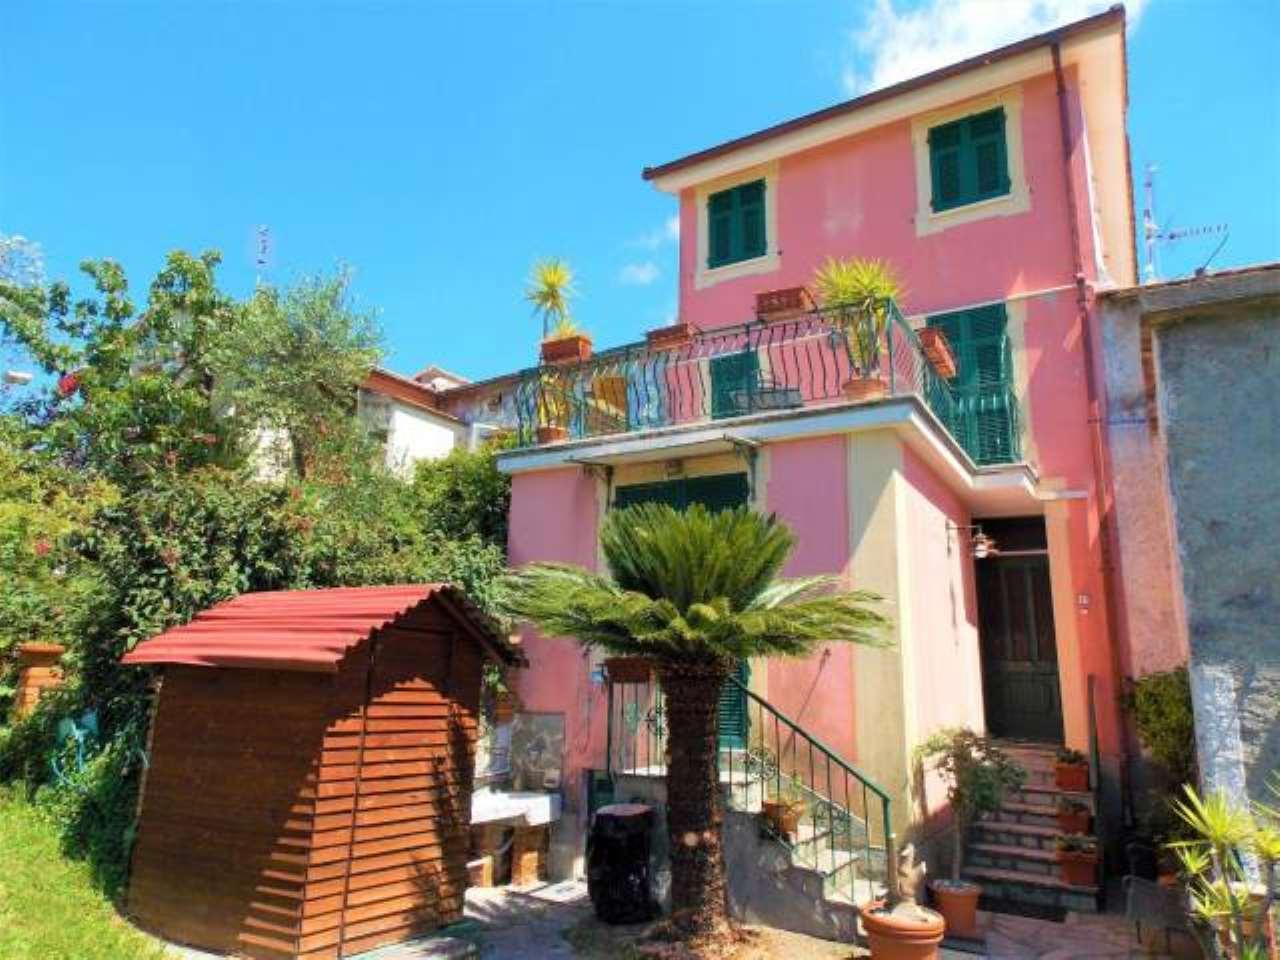 Foto 1 di Villetta a schiera via Crocetta, 15, Leivi